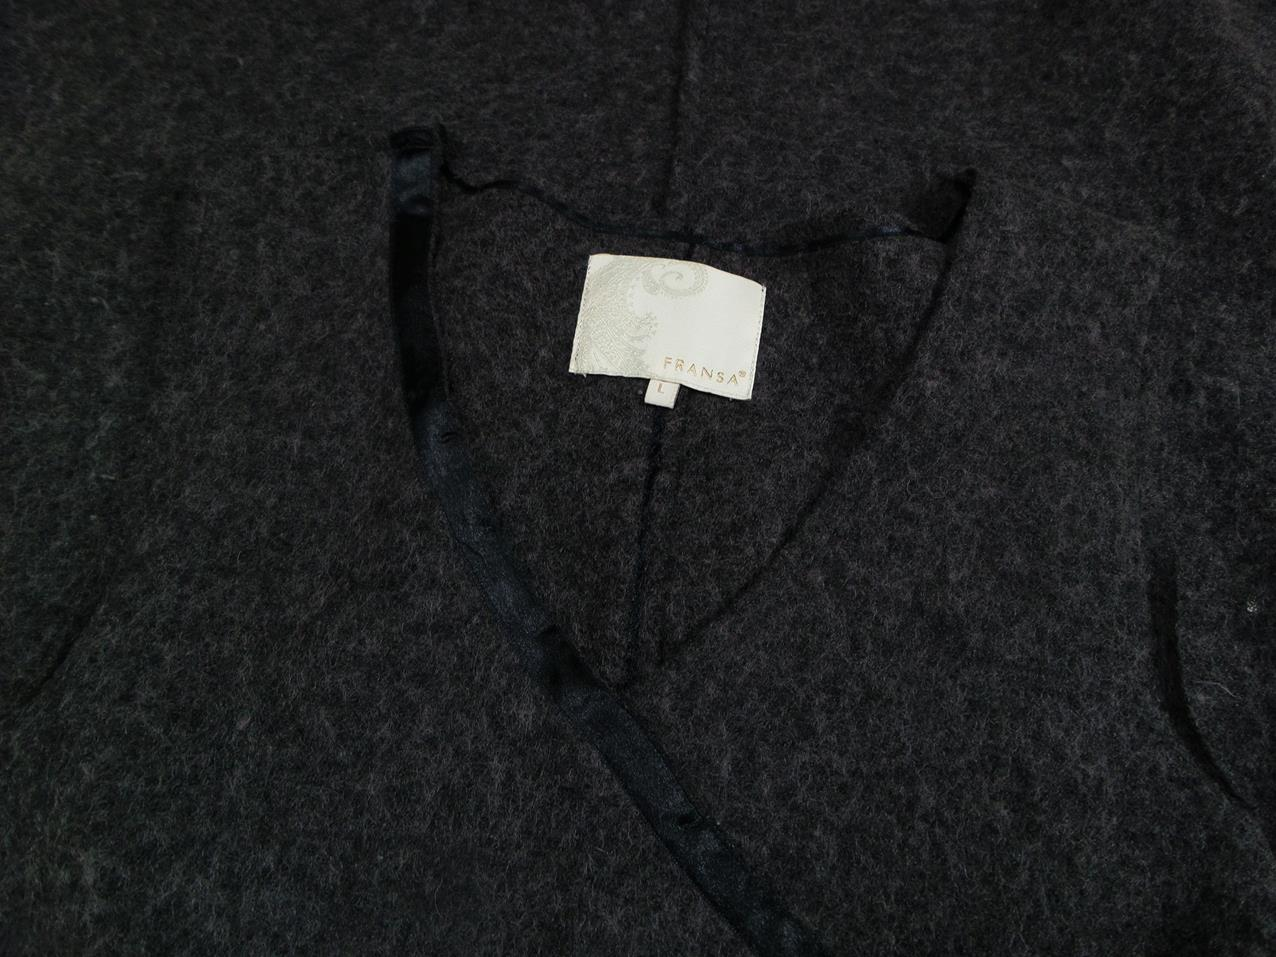 4296ac19 ... Frans størrelse L varme kjole på stropper viskose grå. <>